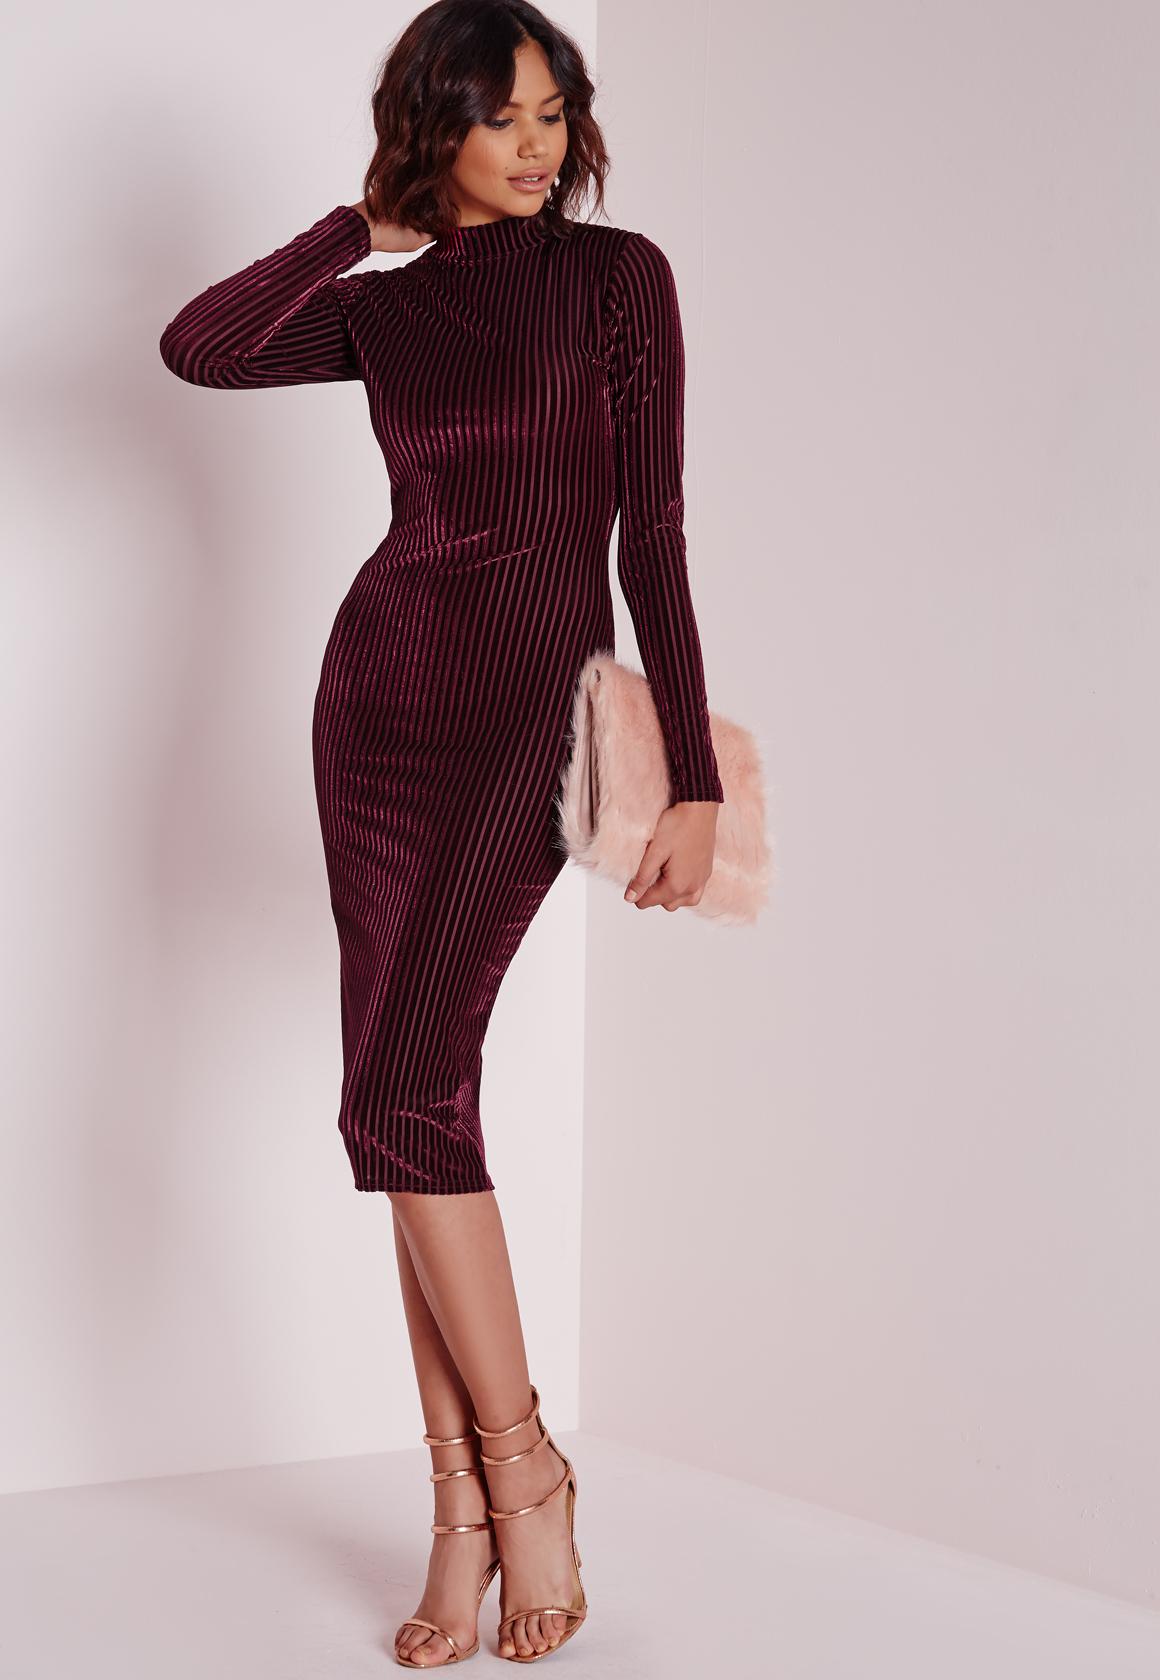 dddc05700aa Lyst - Missguided Velvet Ribbed Long Sleeve Midi Dress Burgundy in ...